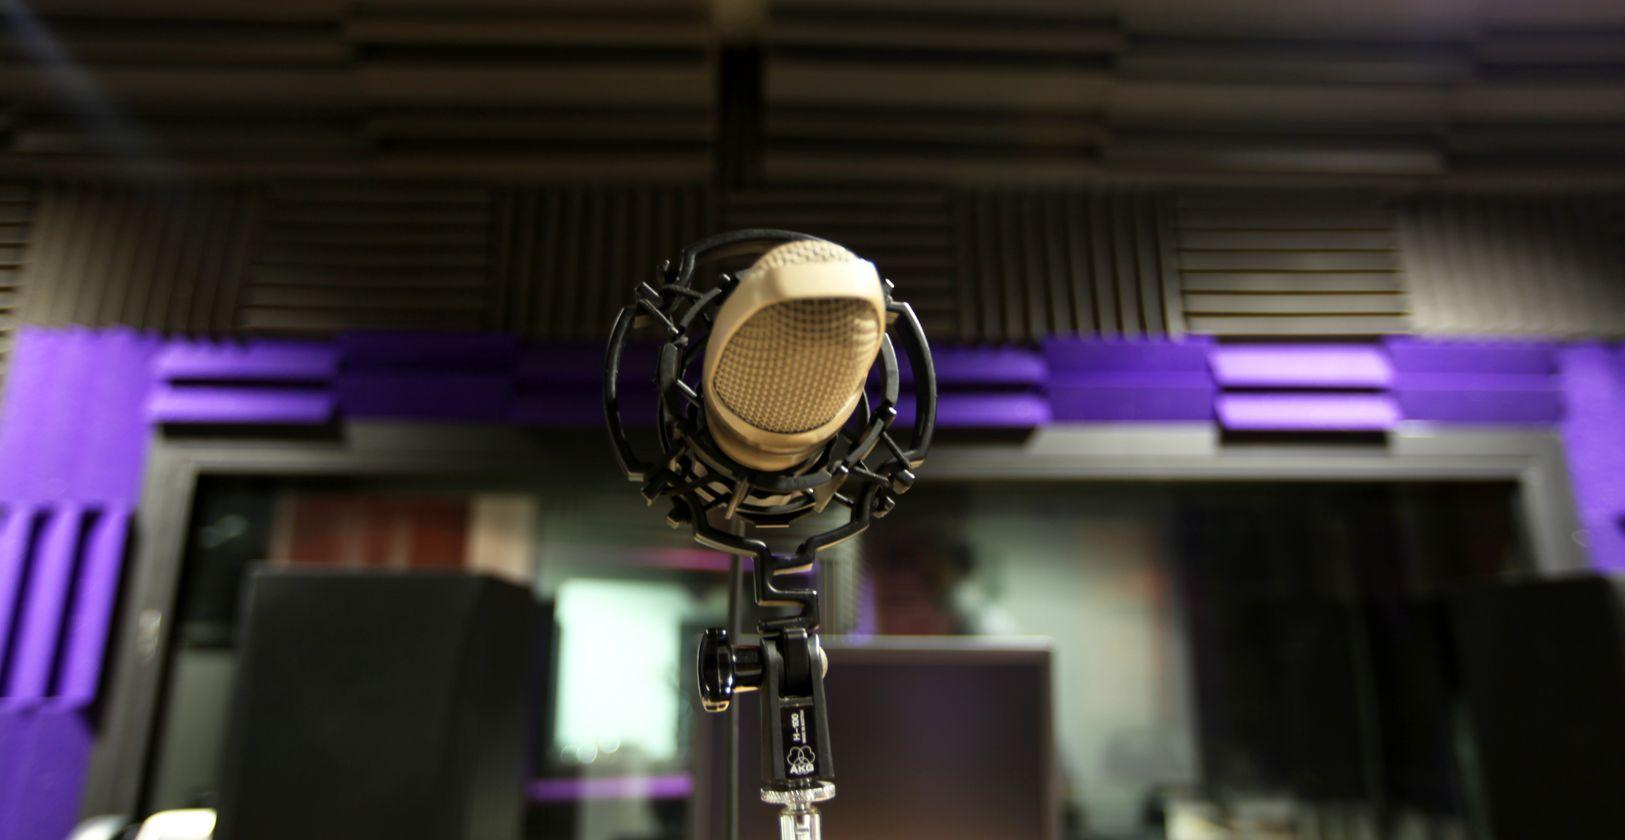 microfono sala de musica_result.jpg